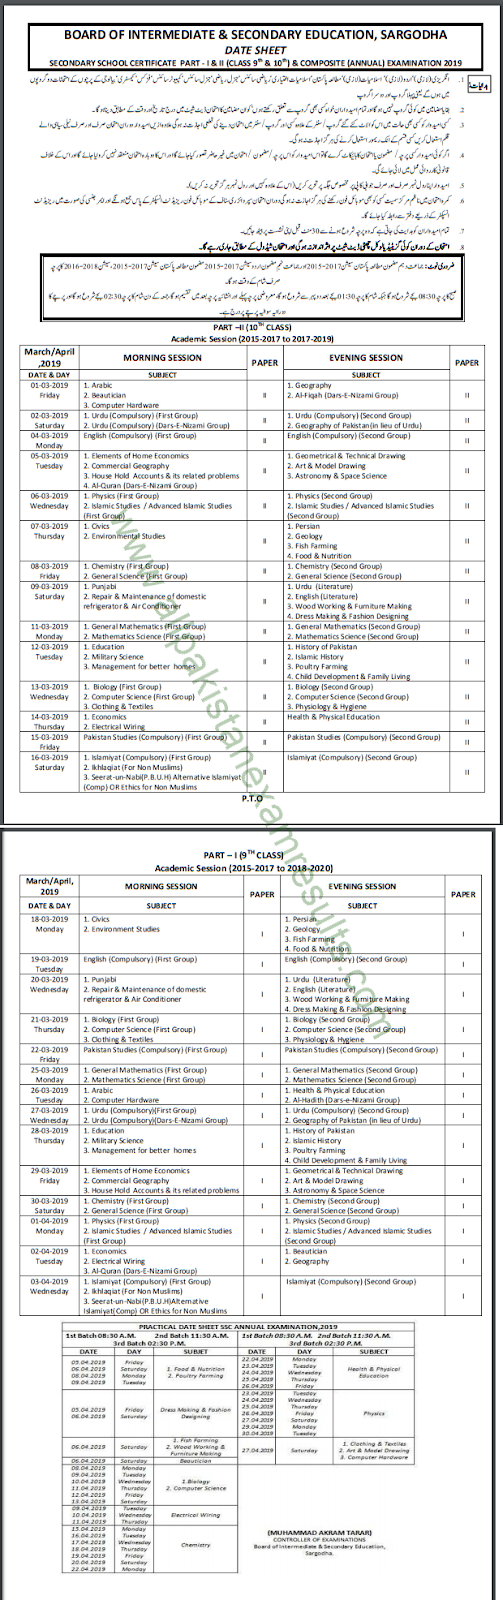 BISE Sargodha 10th Class Date Sheet 2019